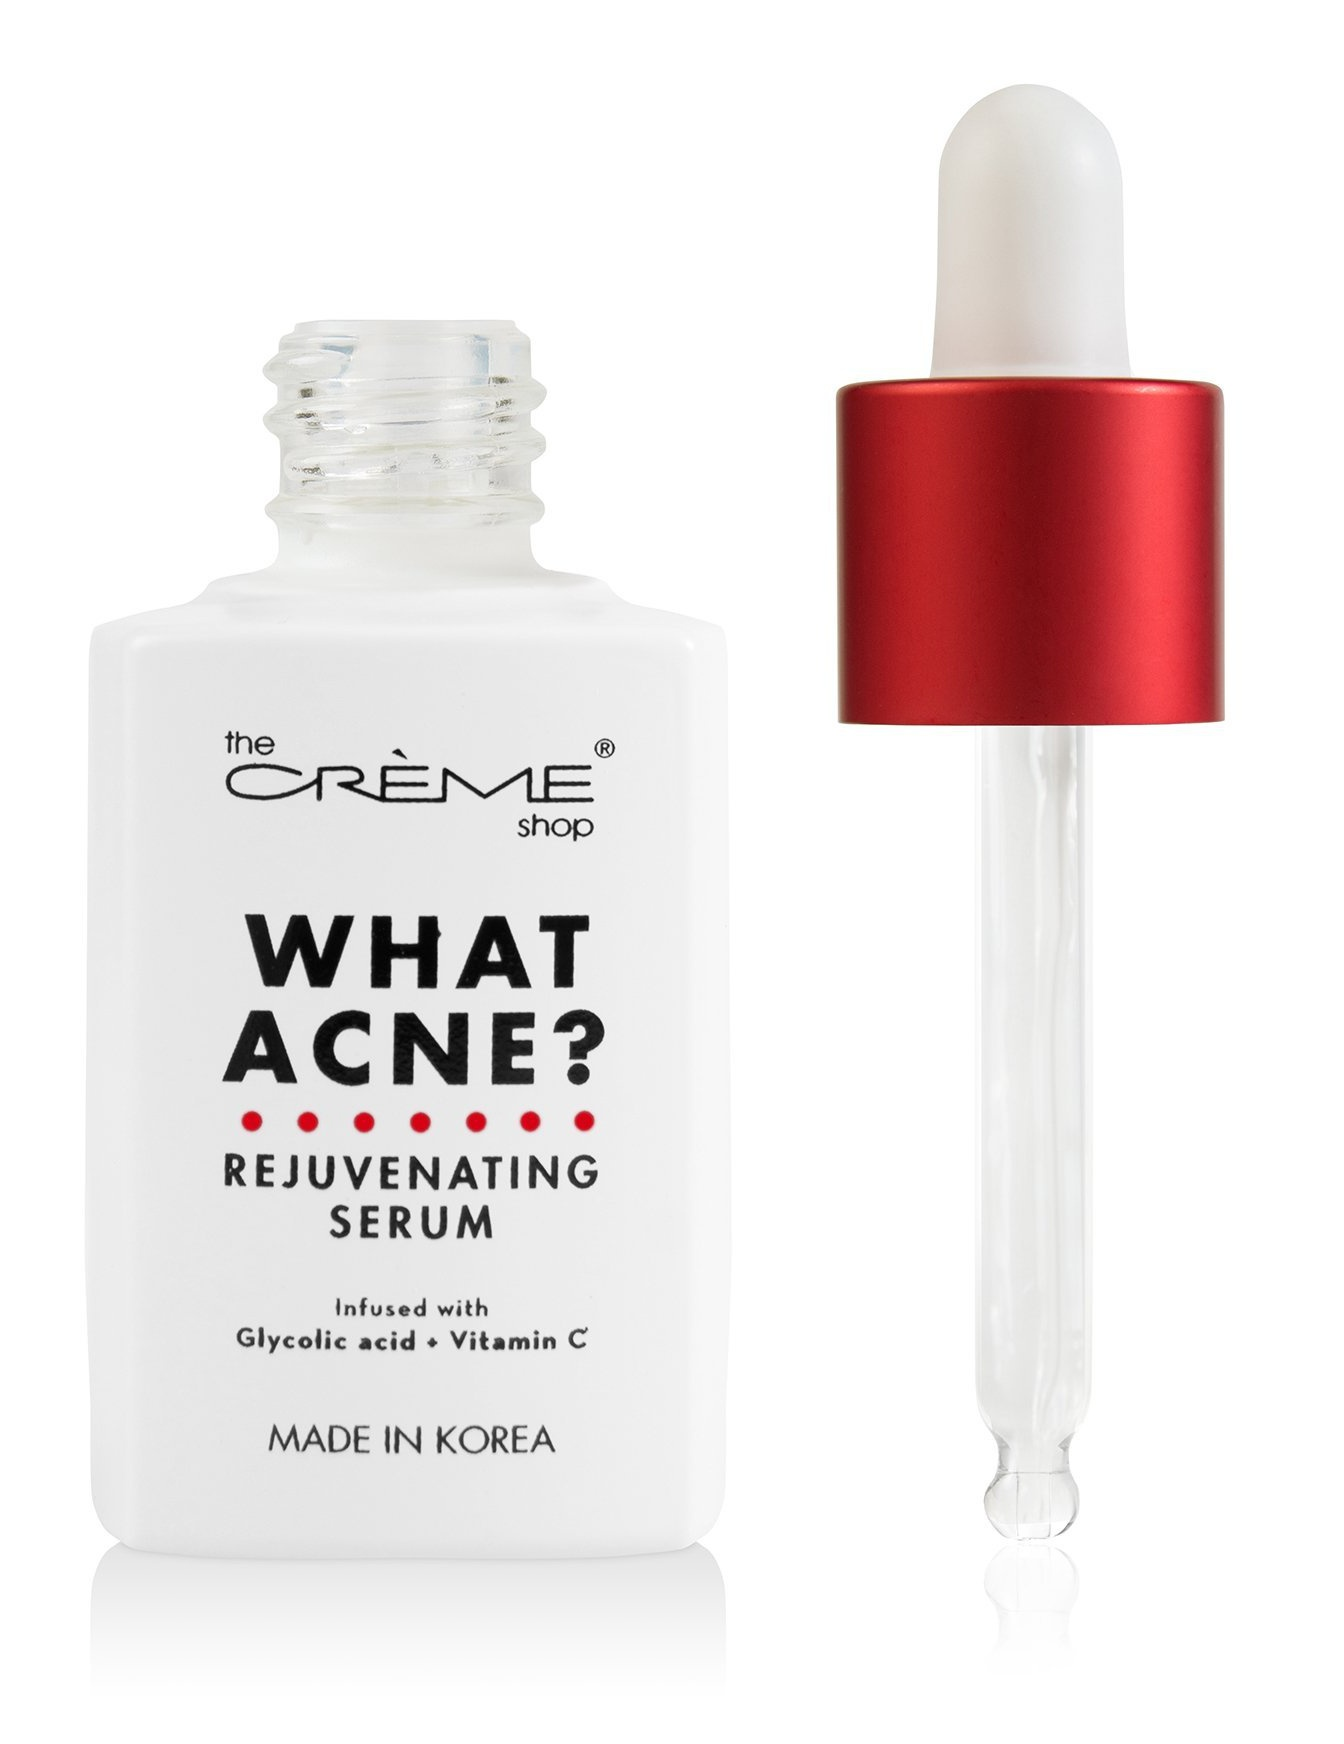 The Creme Shop What Acne? Rejuvenating Serum